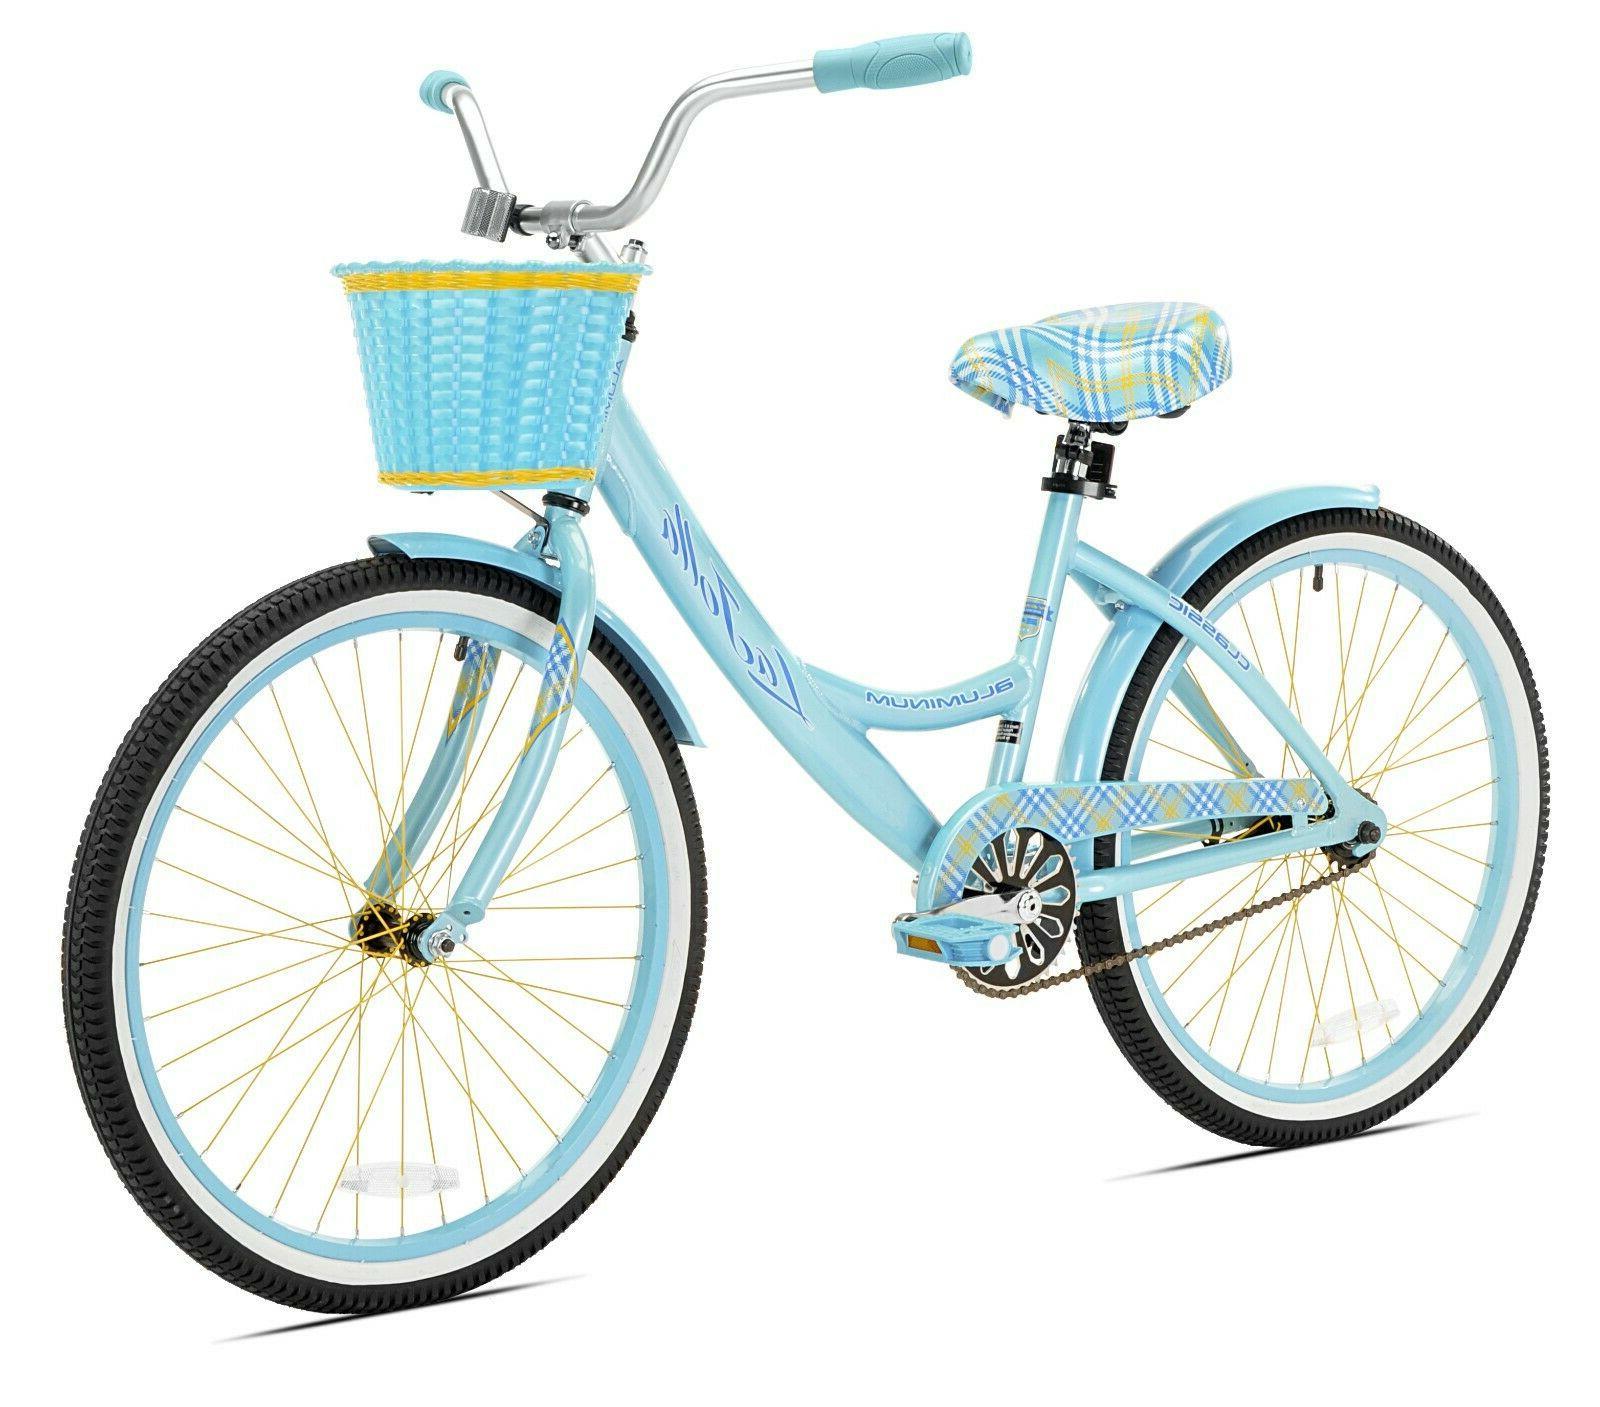 A Bike For Girls Road Bikes Women Cruiser Beach Comfort Teal